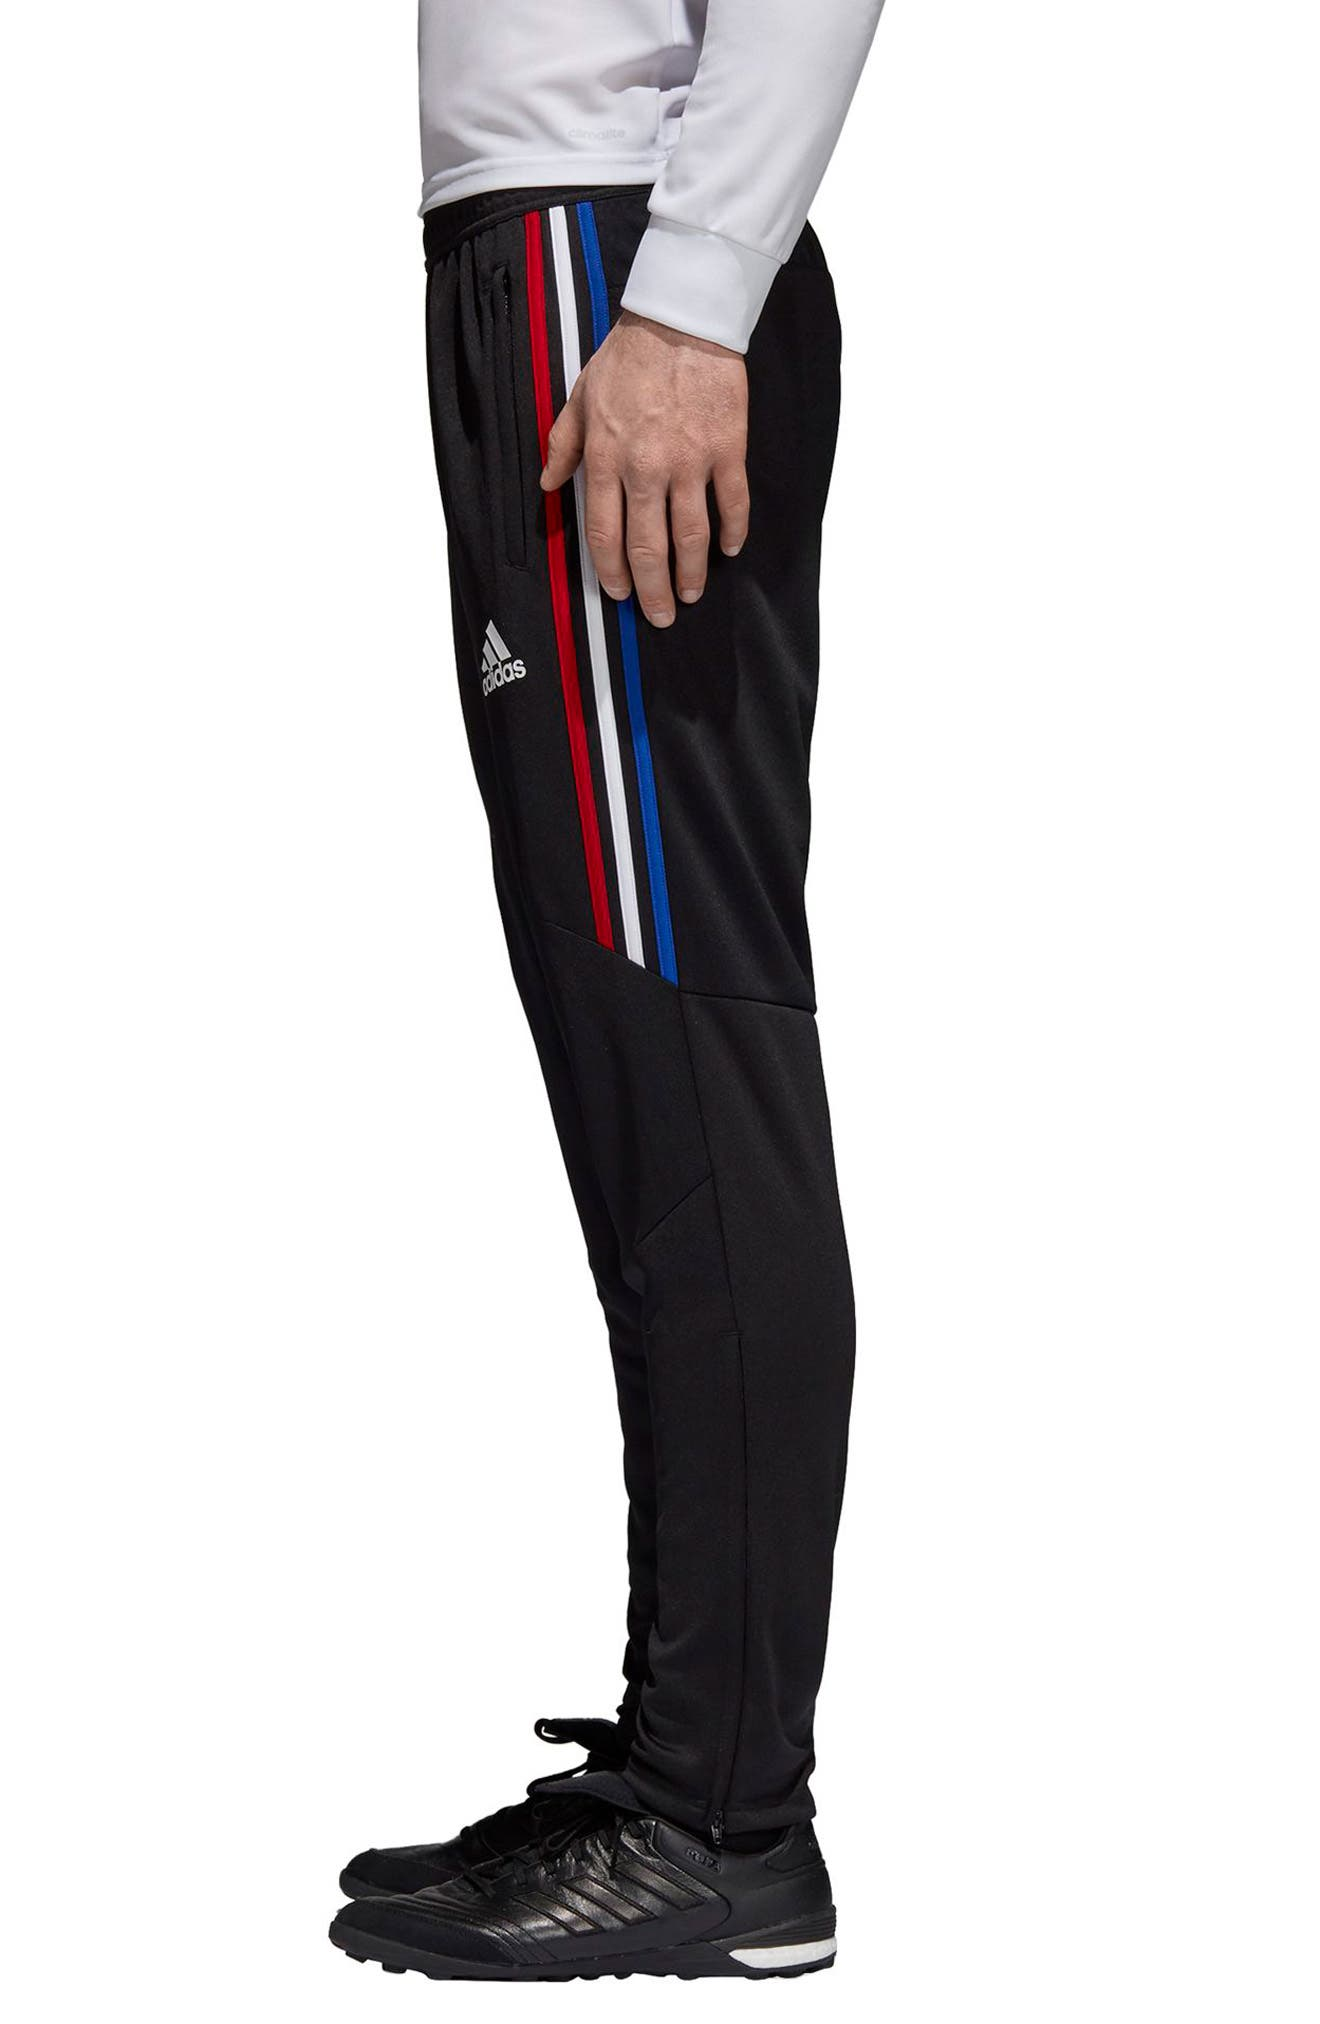 ADIDAS, Tiro 17 Regular Fit Training Pants, Alternate thumbnail 4, color, BLACK/ RED/ WHITE/ BLUE